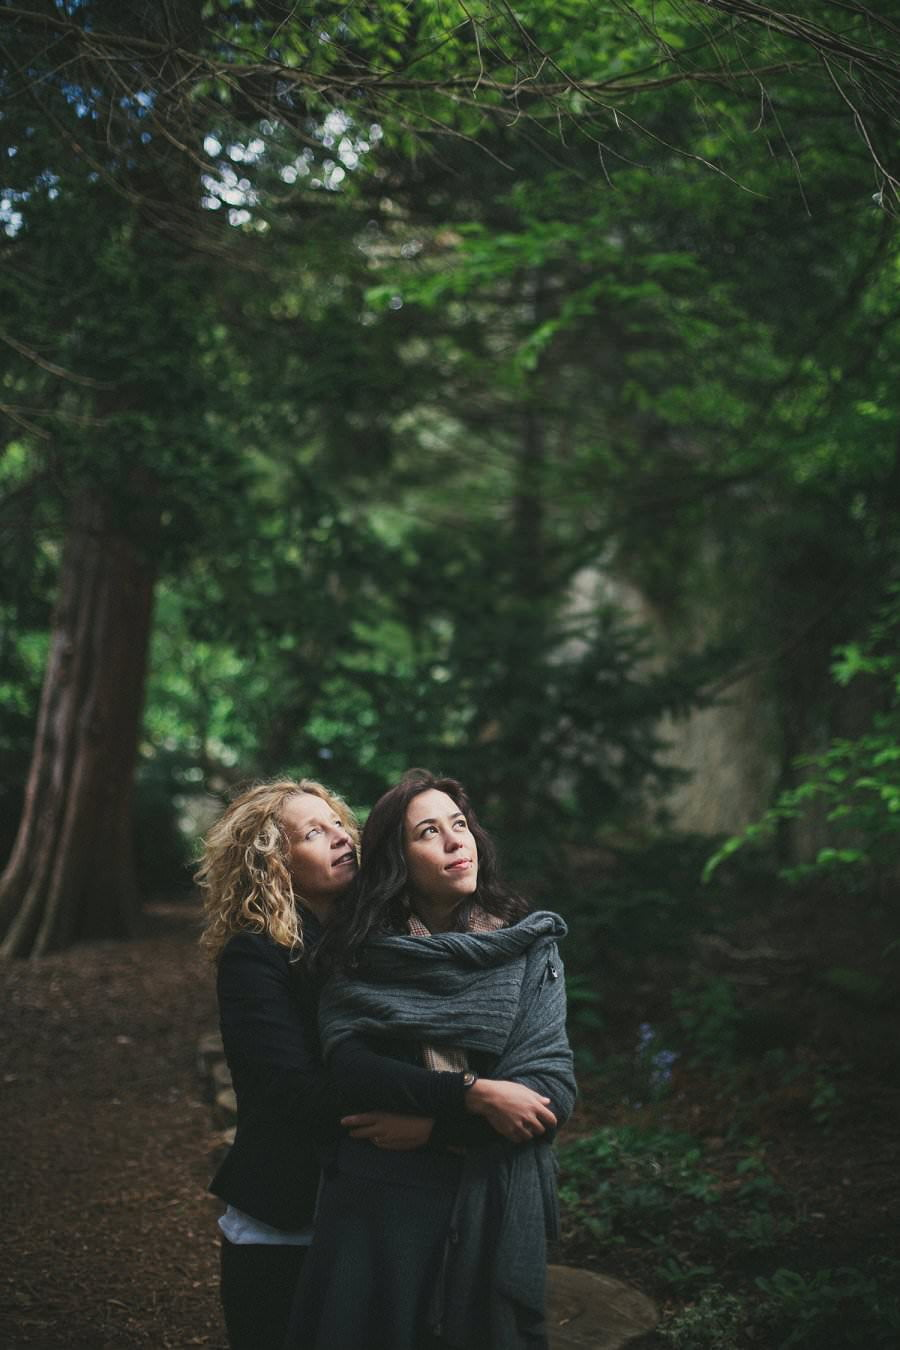 artistic-pre-wedding-engagement-photography-glasgow-pollok-park27